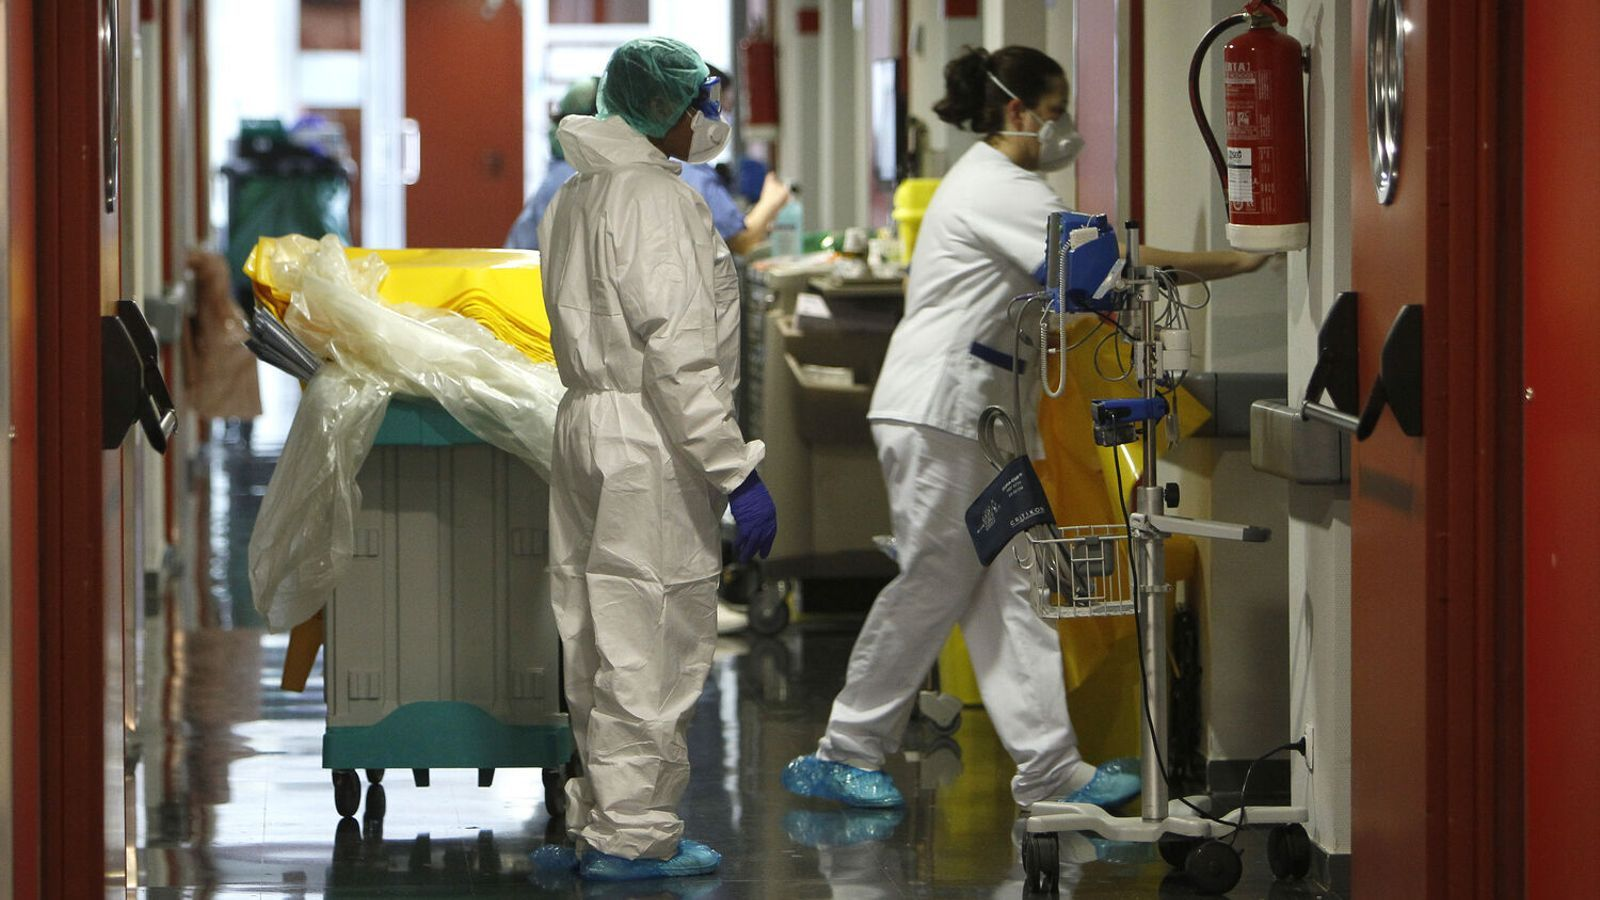 Sanitaris treballant en la planta de contagiats per covid-19 a Son Espases. / ISAAC BUJ